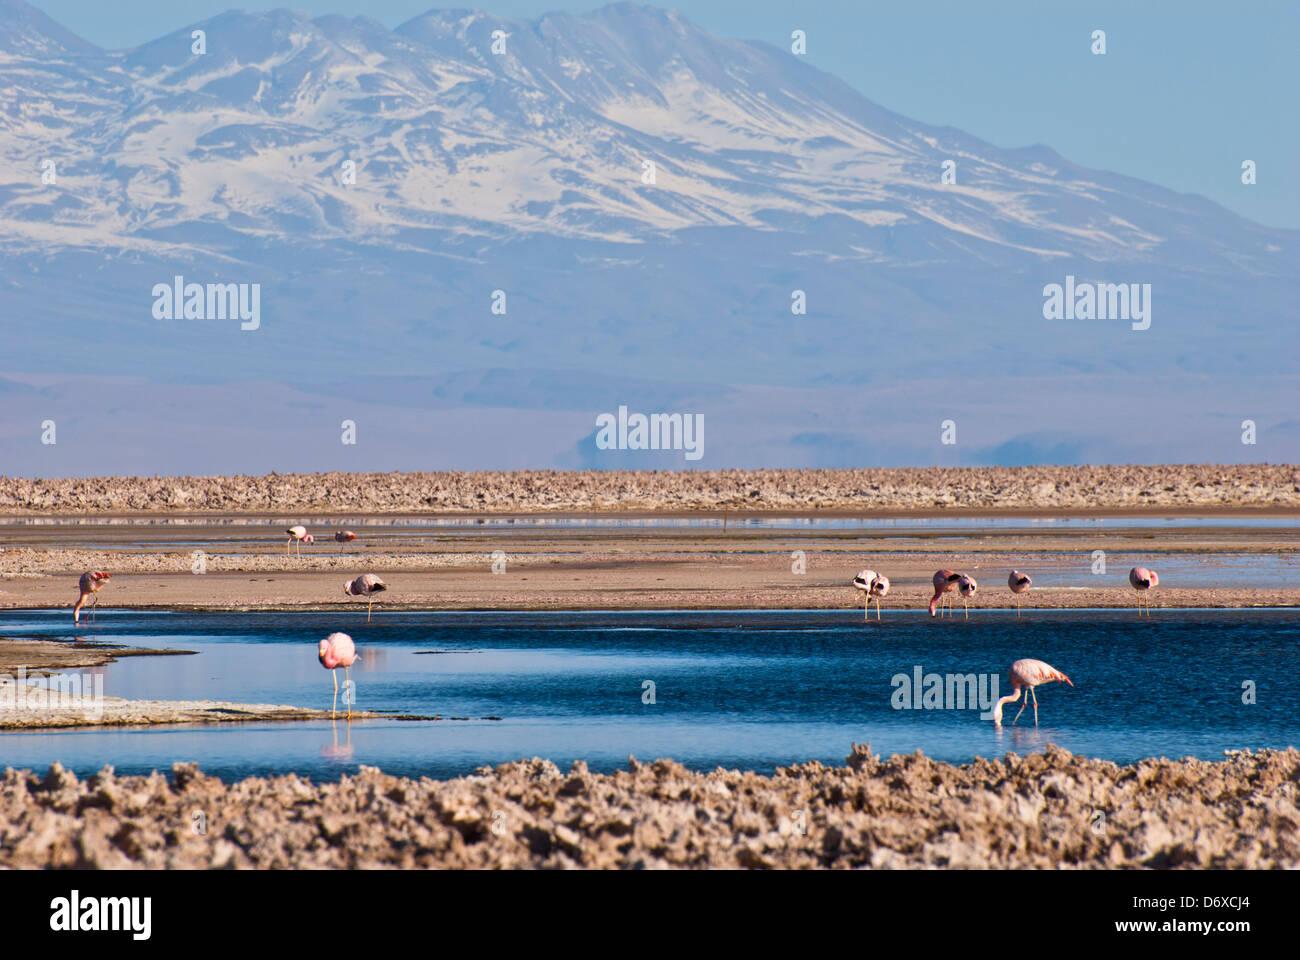 Chilean Flamingo, Laguna Chaxa, Salar de Atacama, Atacama Desert, Chile, South America - Stock Image